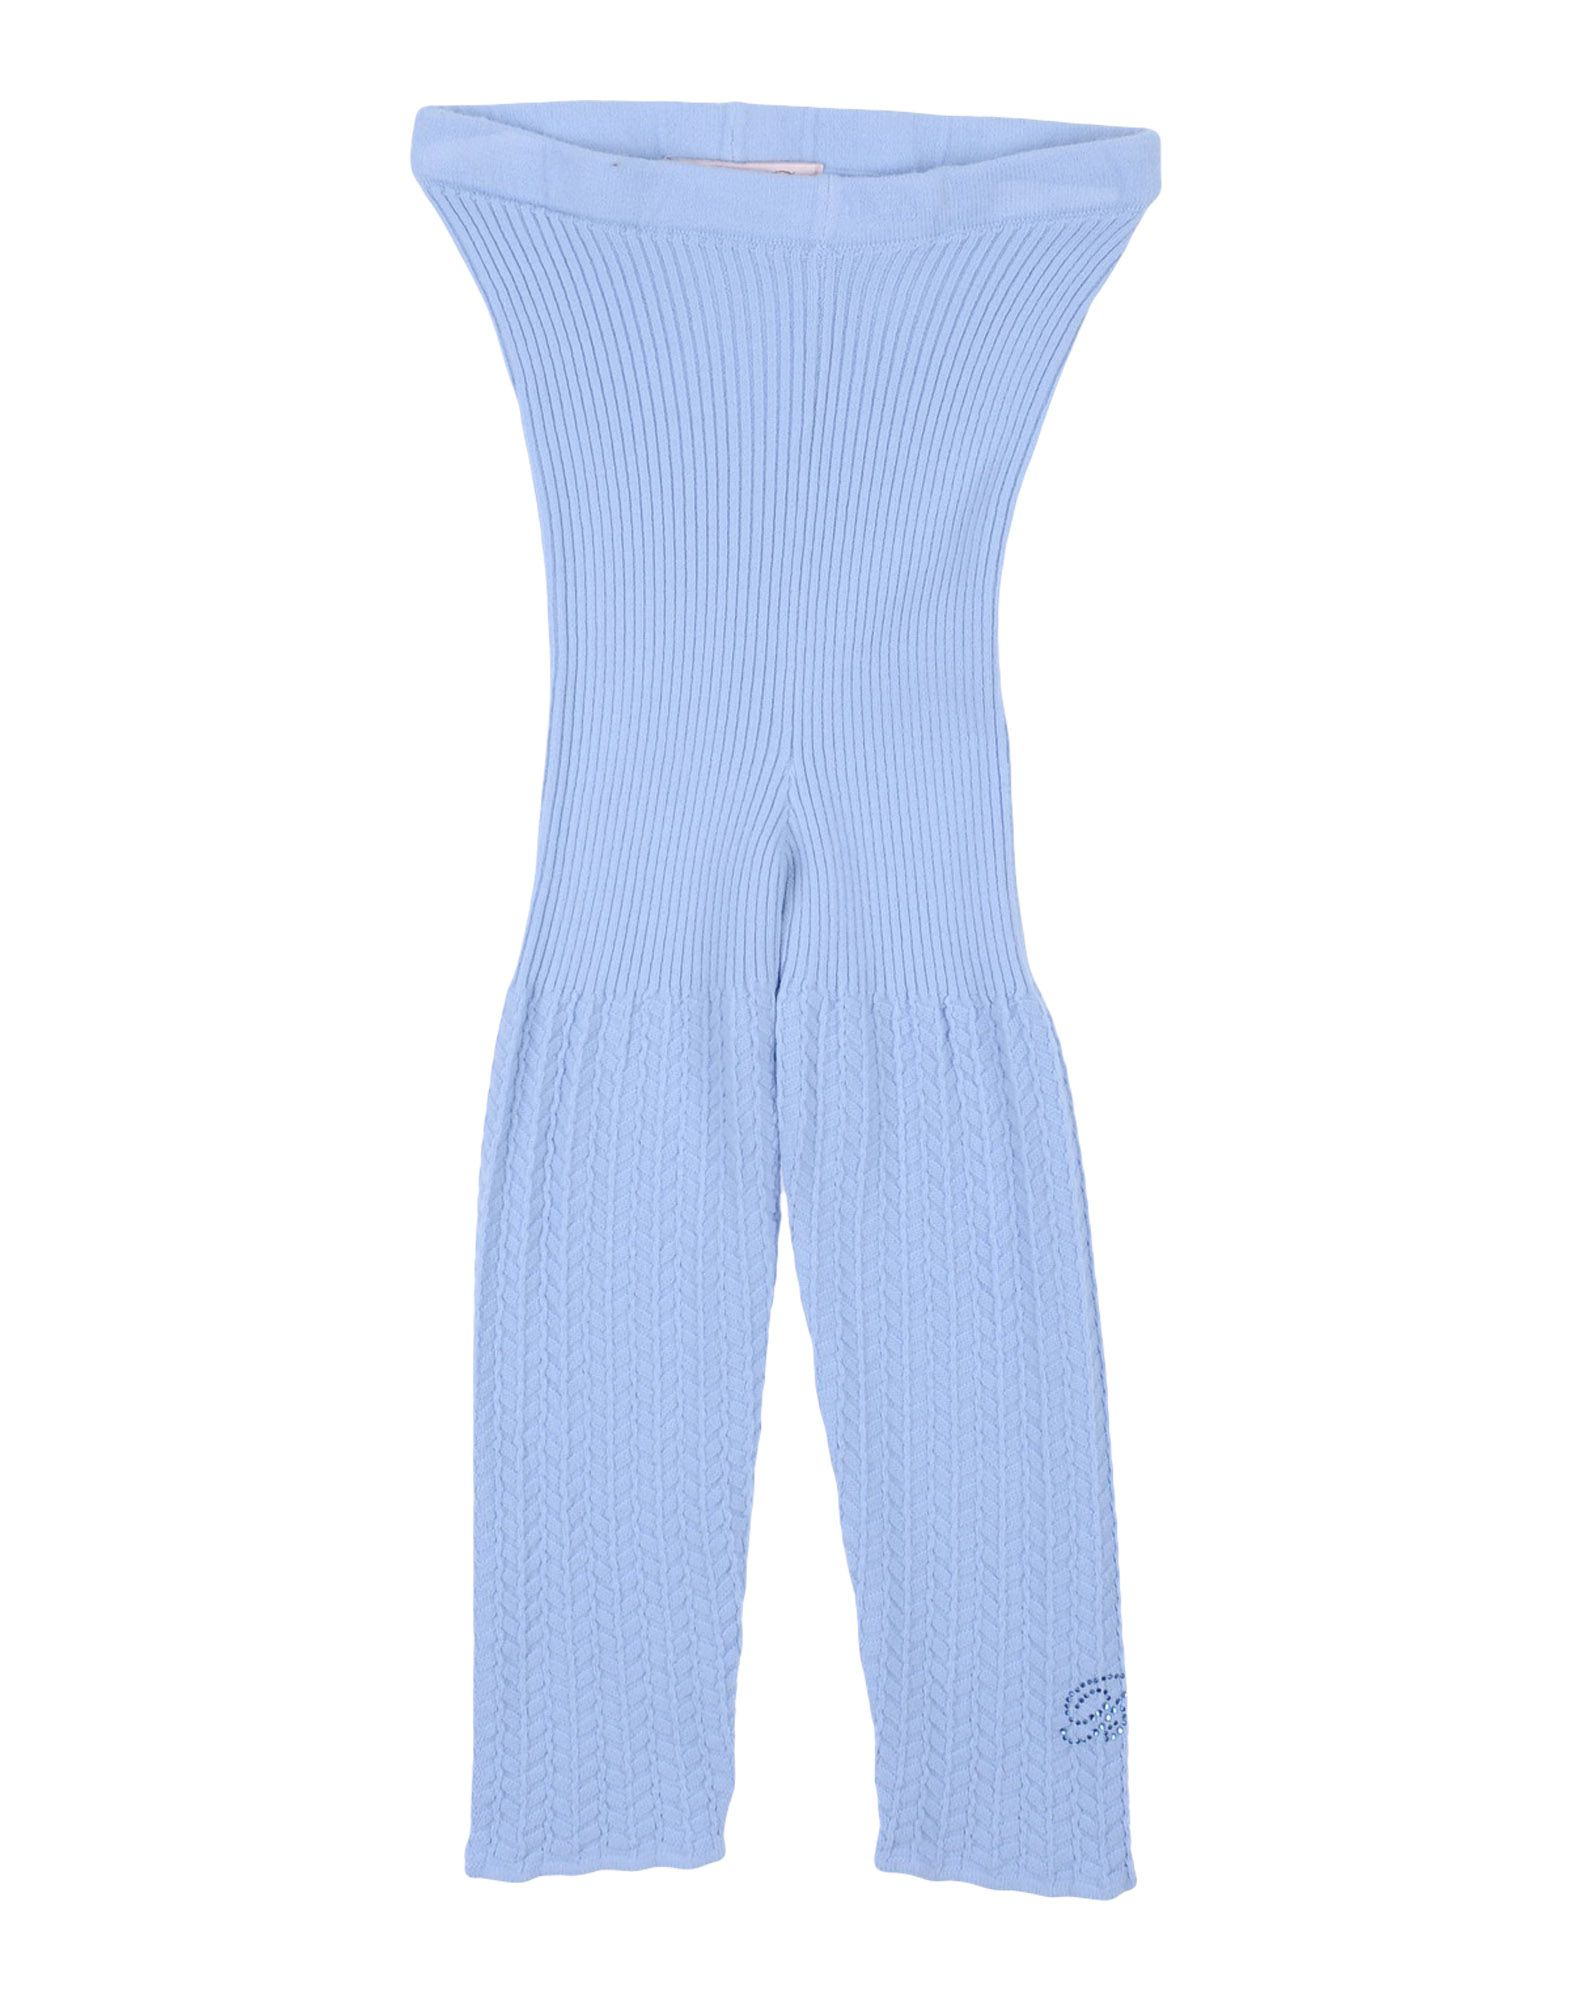 MISS BLUMARINE Легинсы miss blumarine jeans одеяло